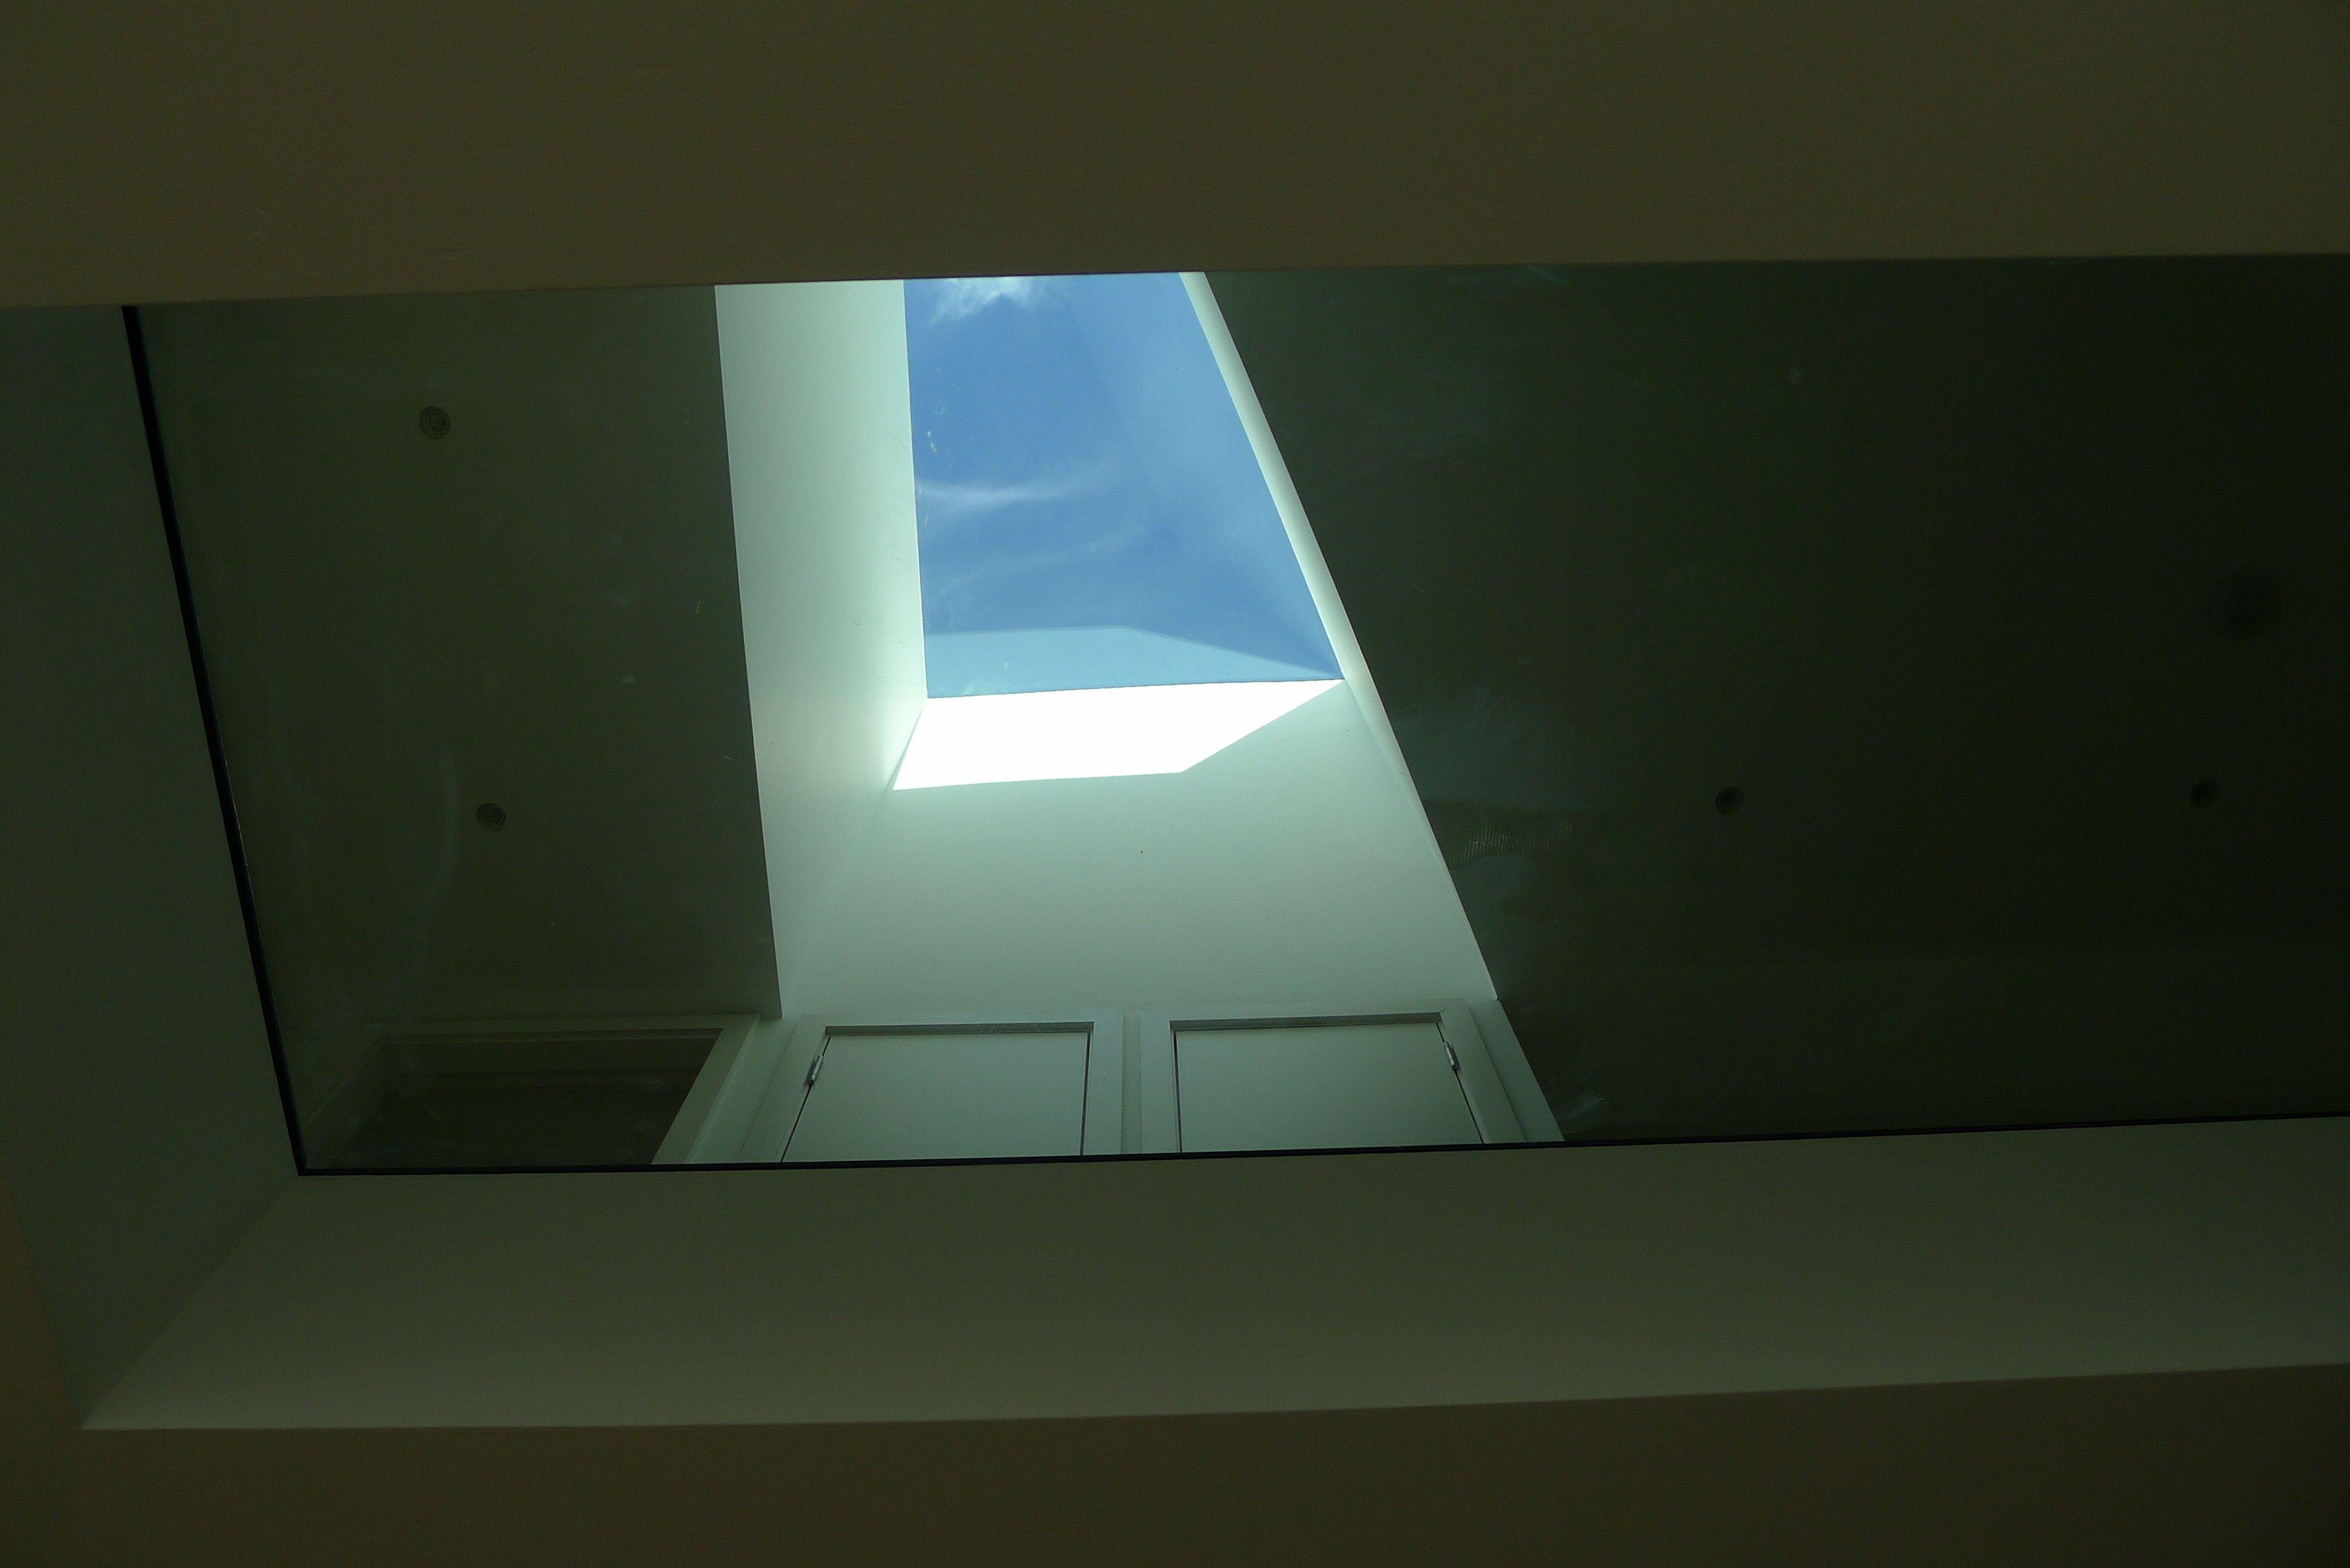 Hall window 28/5/12